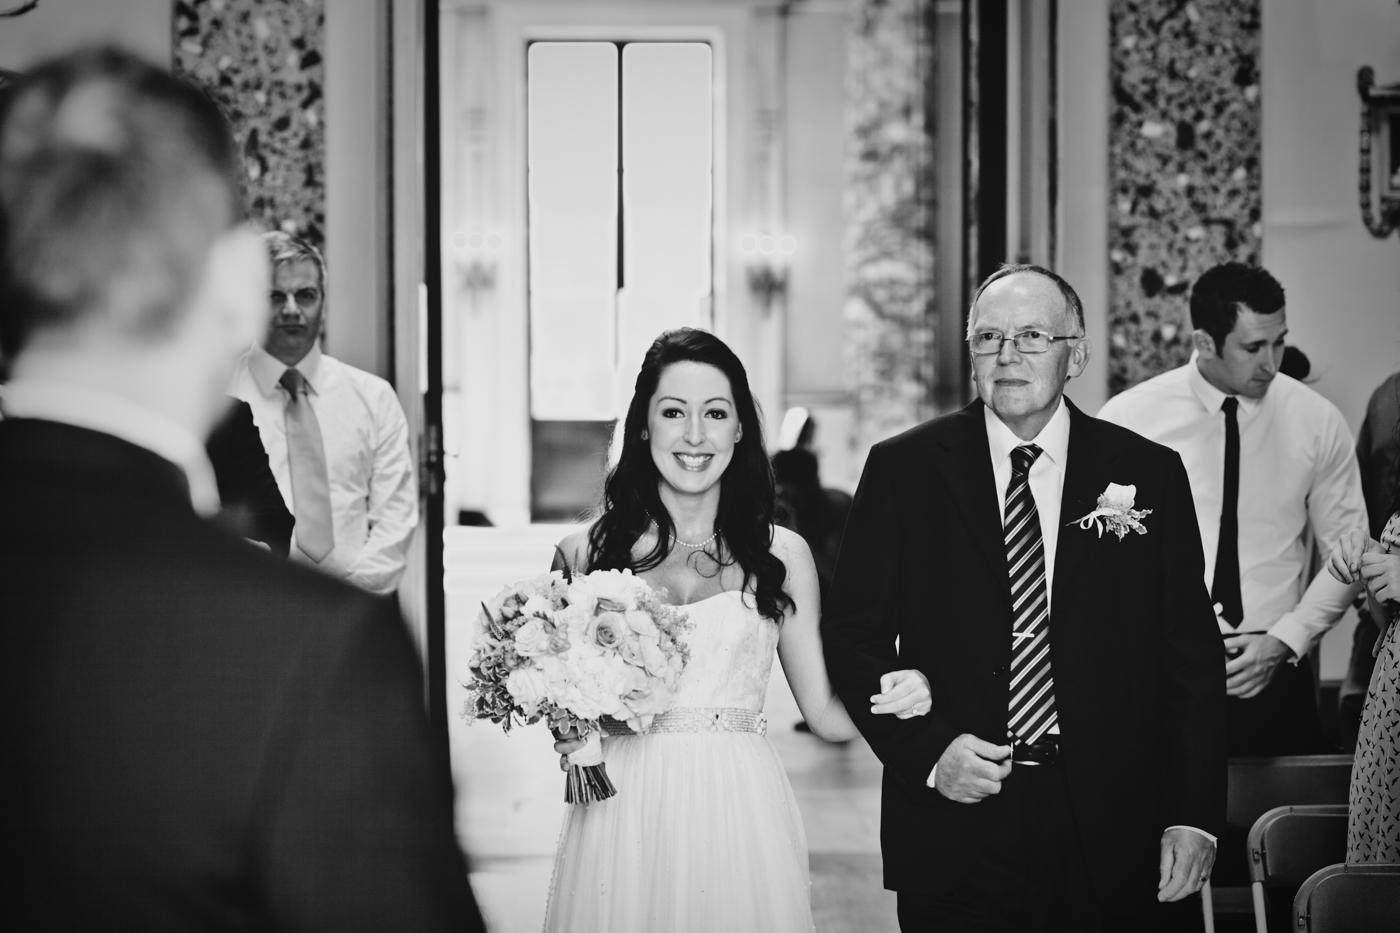 049 - Abi and Chris at Kedleston Hall - Wedding Photography by Mark Pugh www.markpugh.com - 0132.JPG